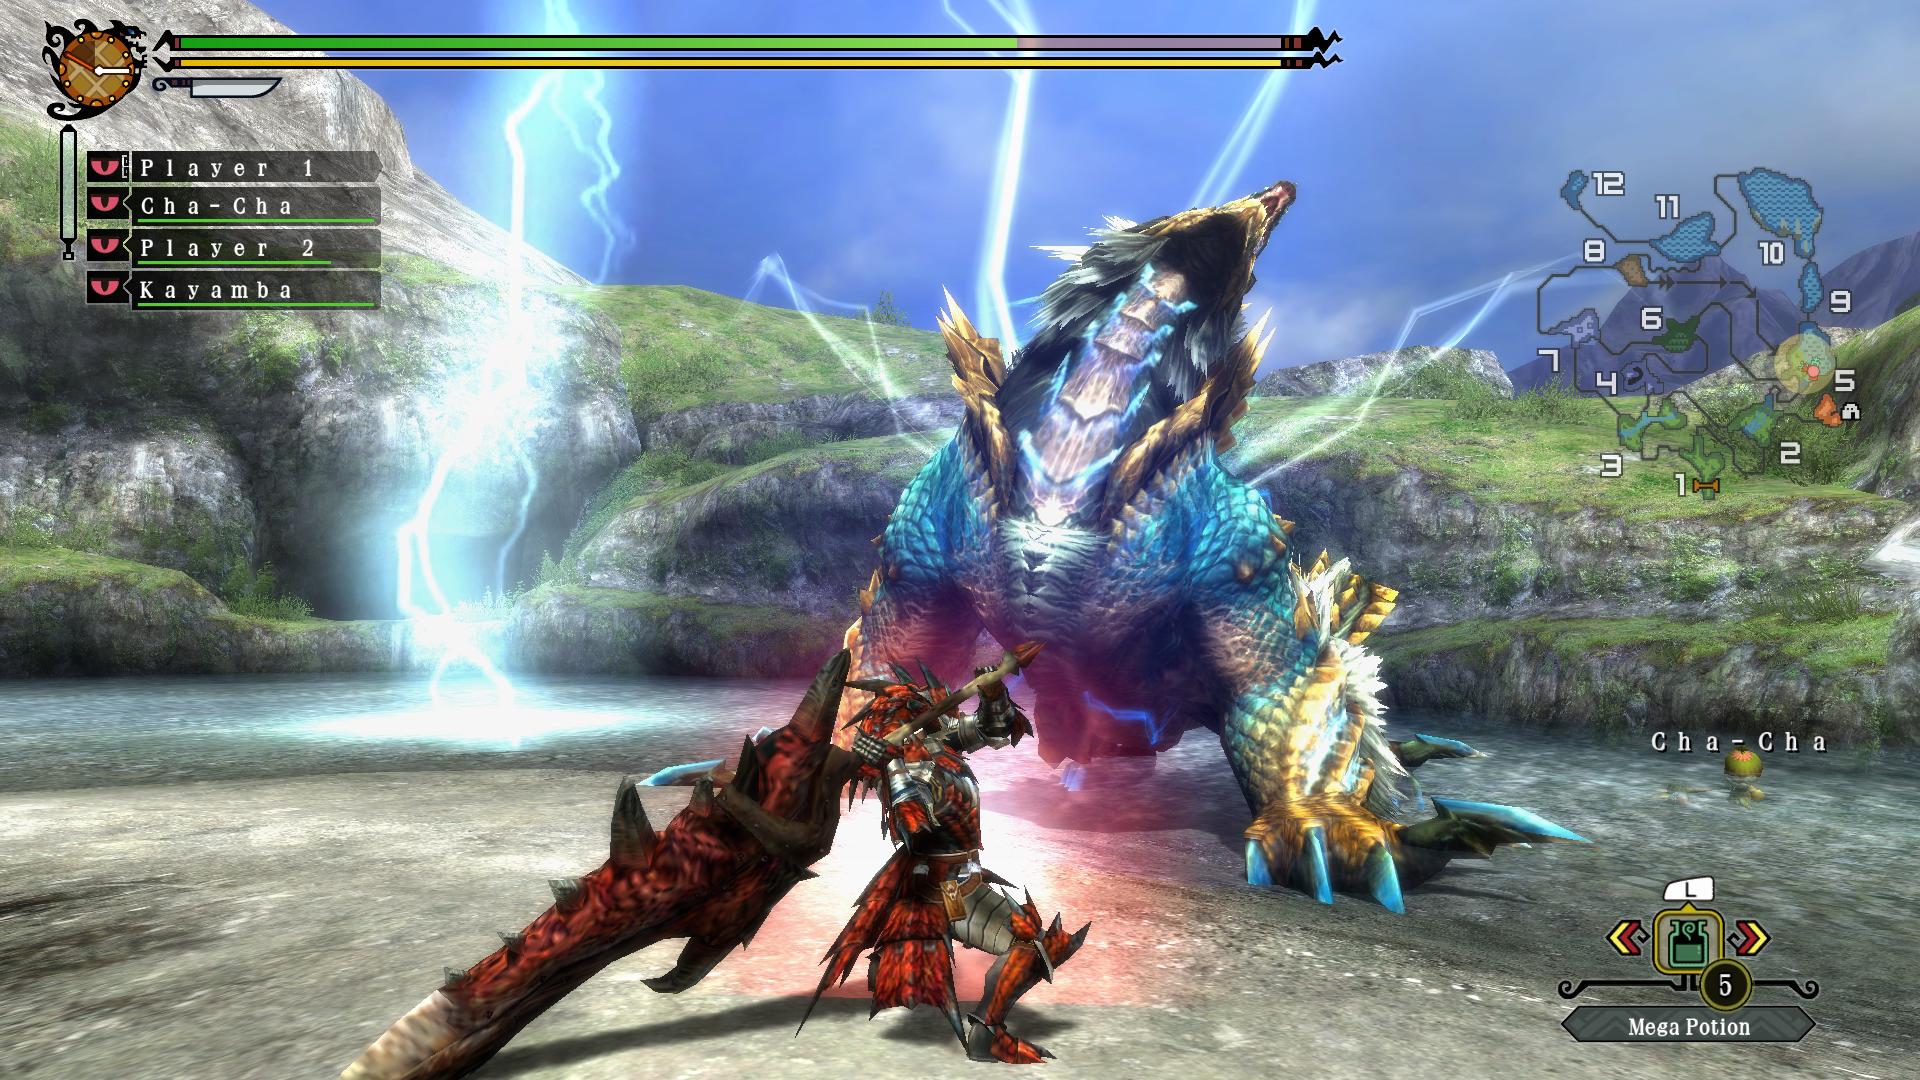 Wii u monster hunter pack : Frases de nacimiento de un hijo